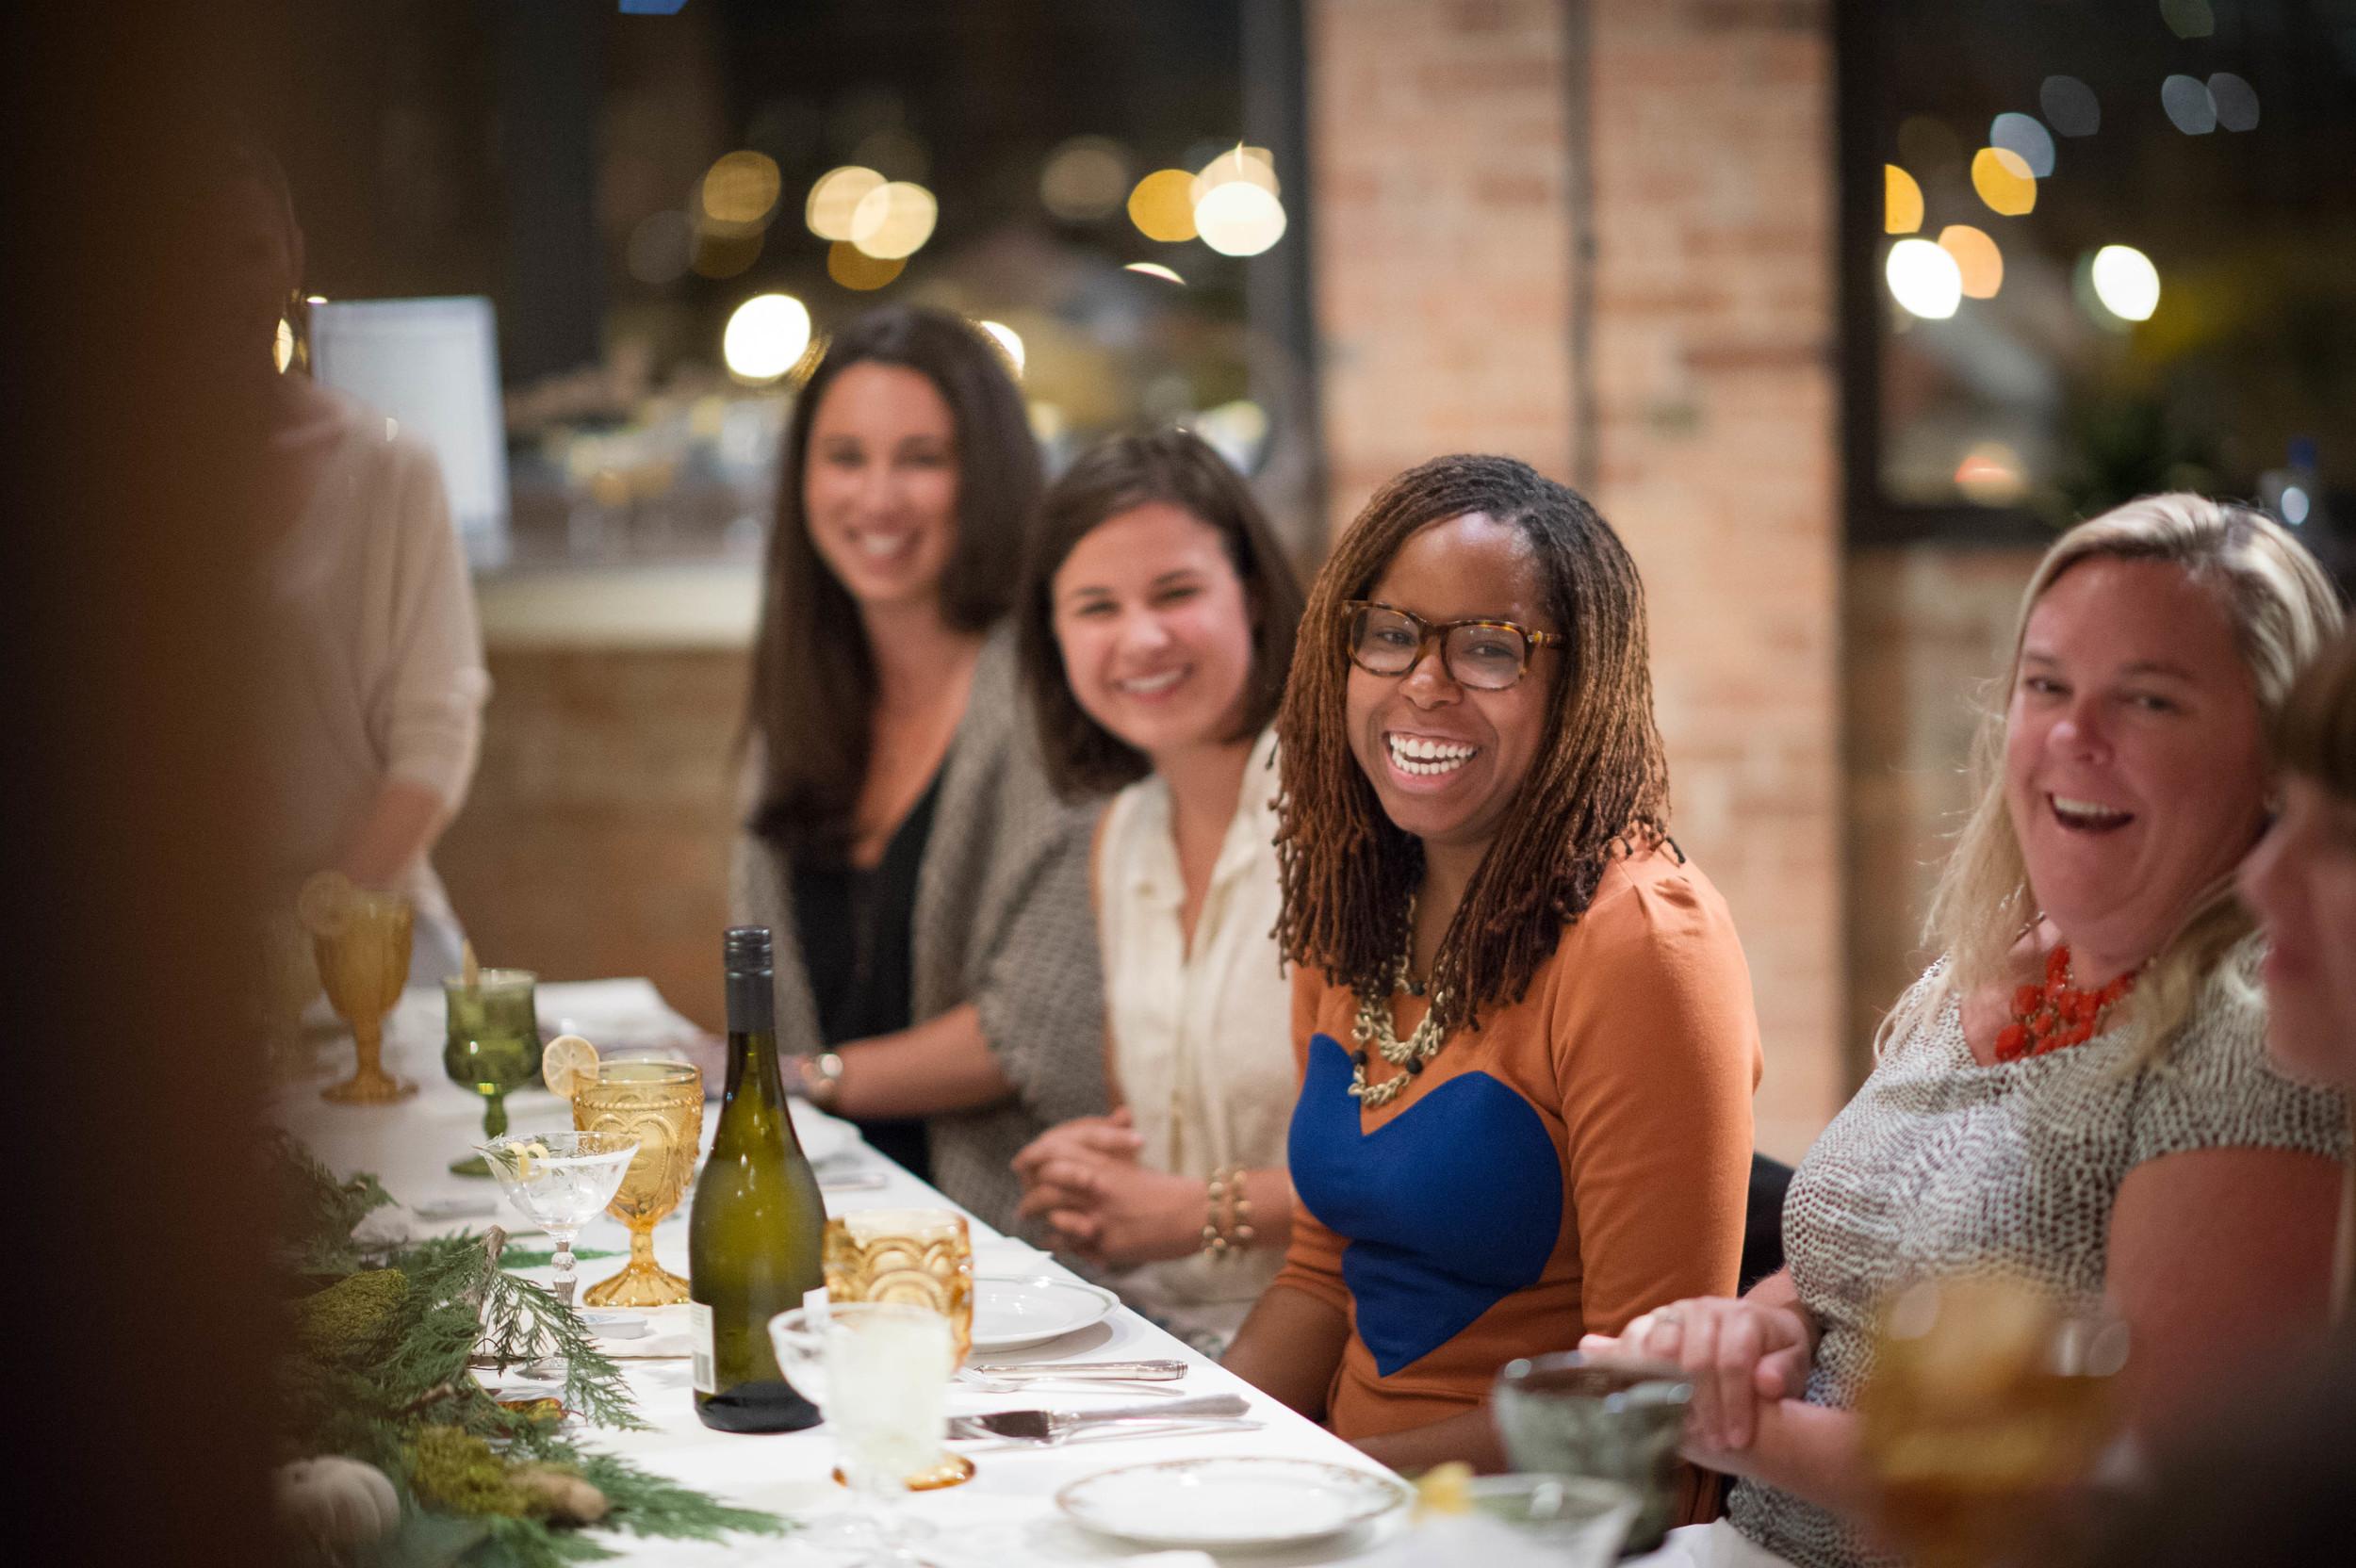 Forth Chicago: A Seasonal Salon for Bright Ideas | Patrice Perkins